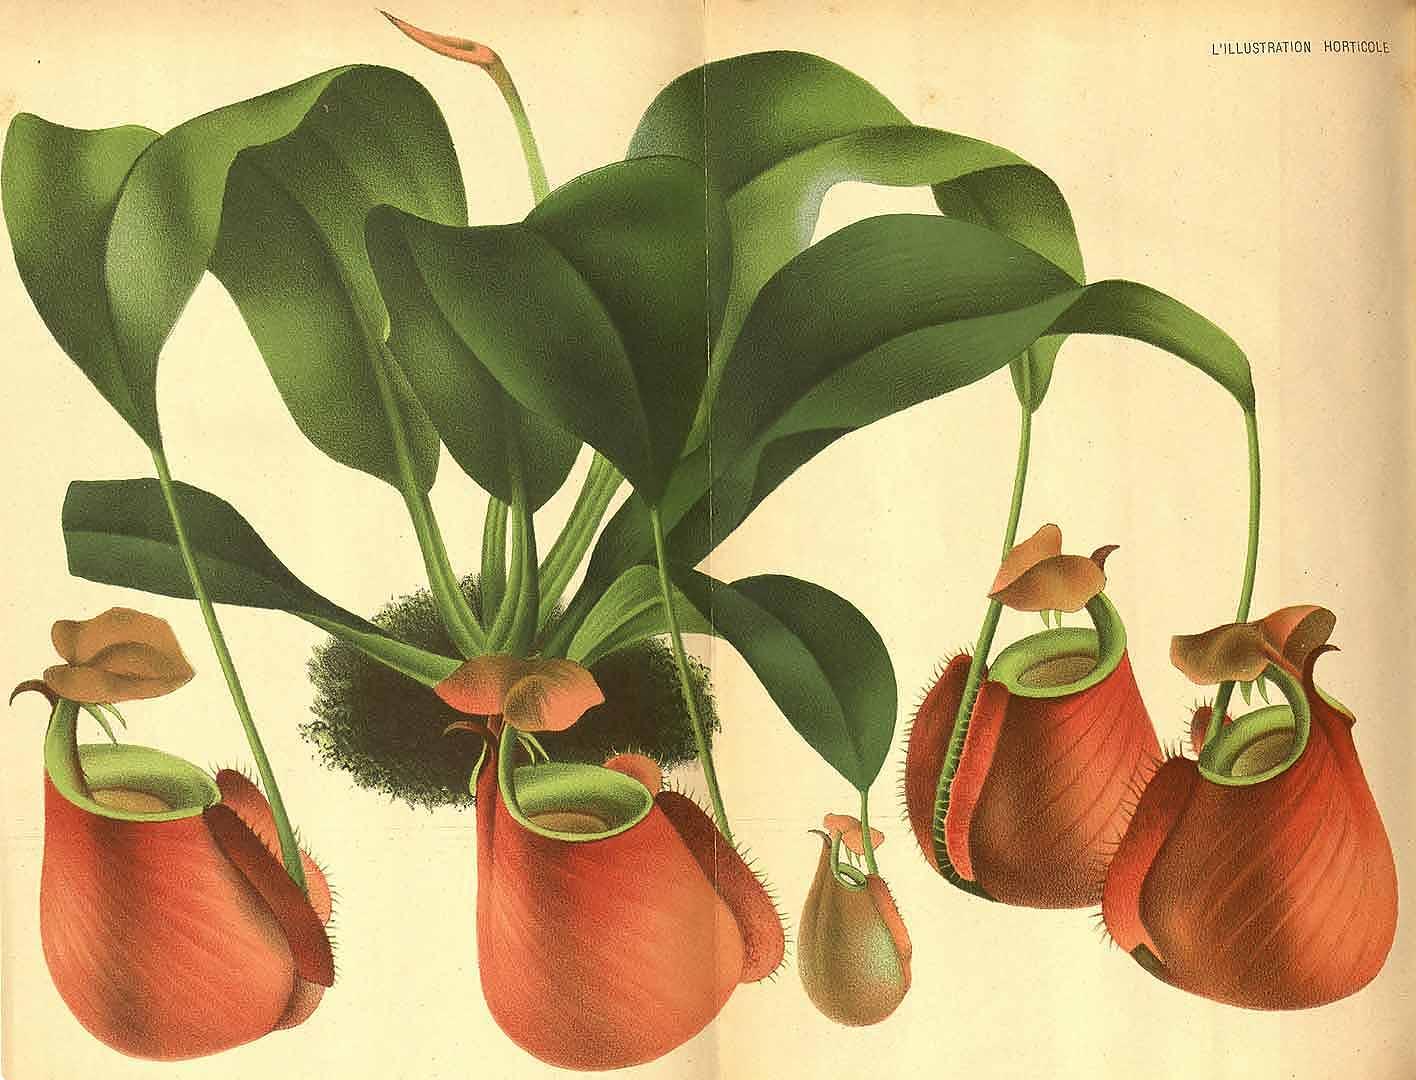 1 Nepenthes bicalcarata Hook.f. / L' Illustration horticole, vol. 28: t. 408 (1871)